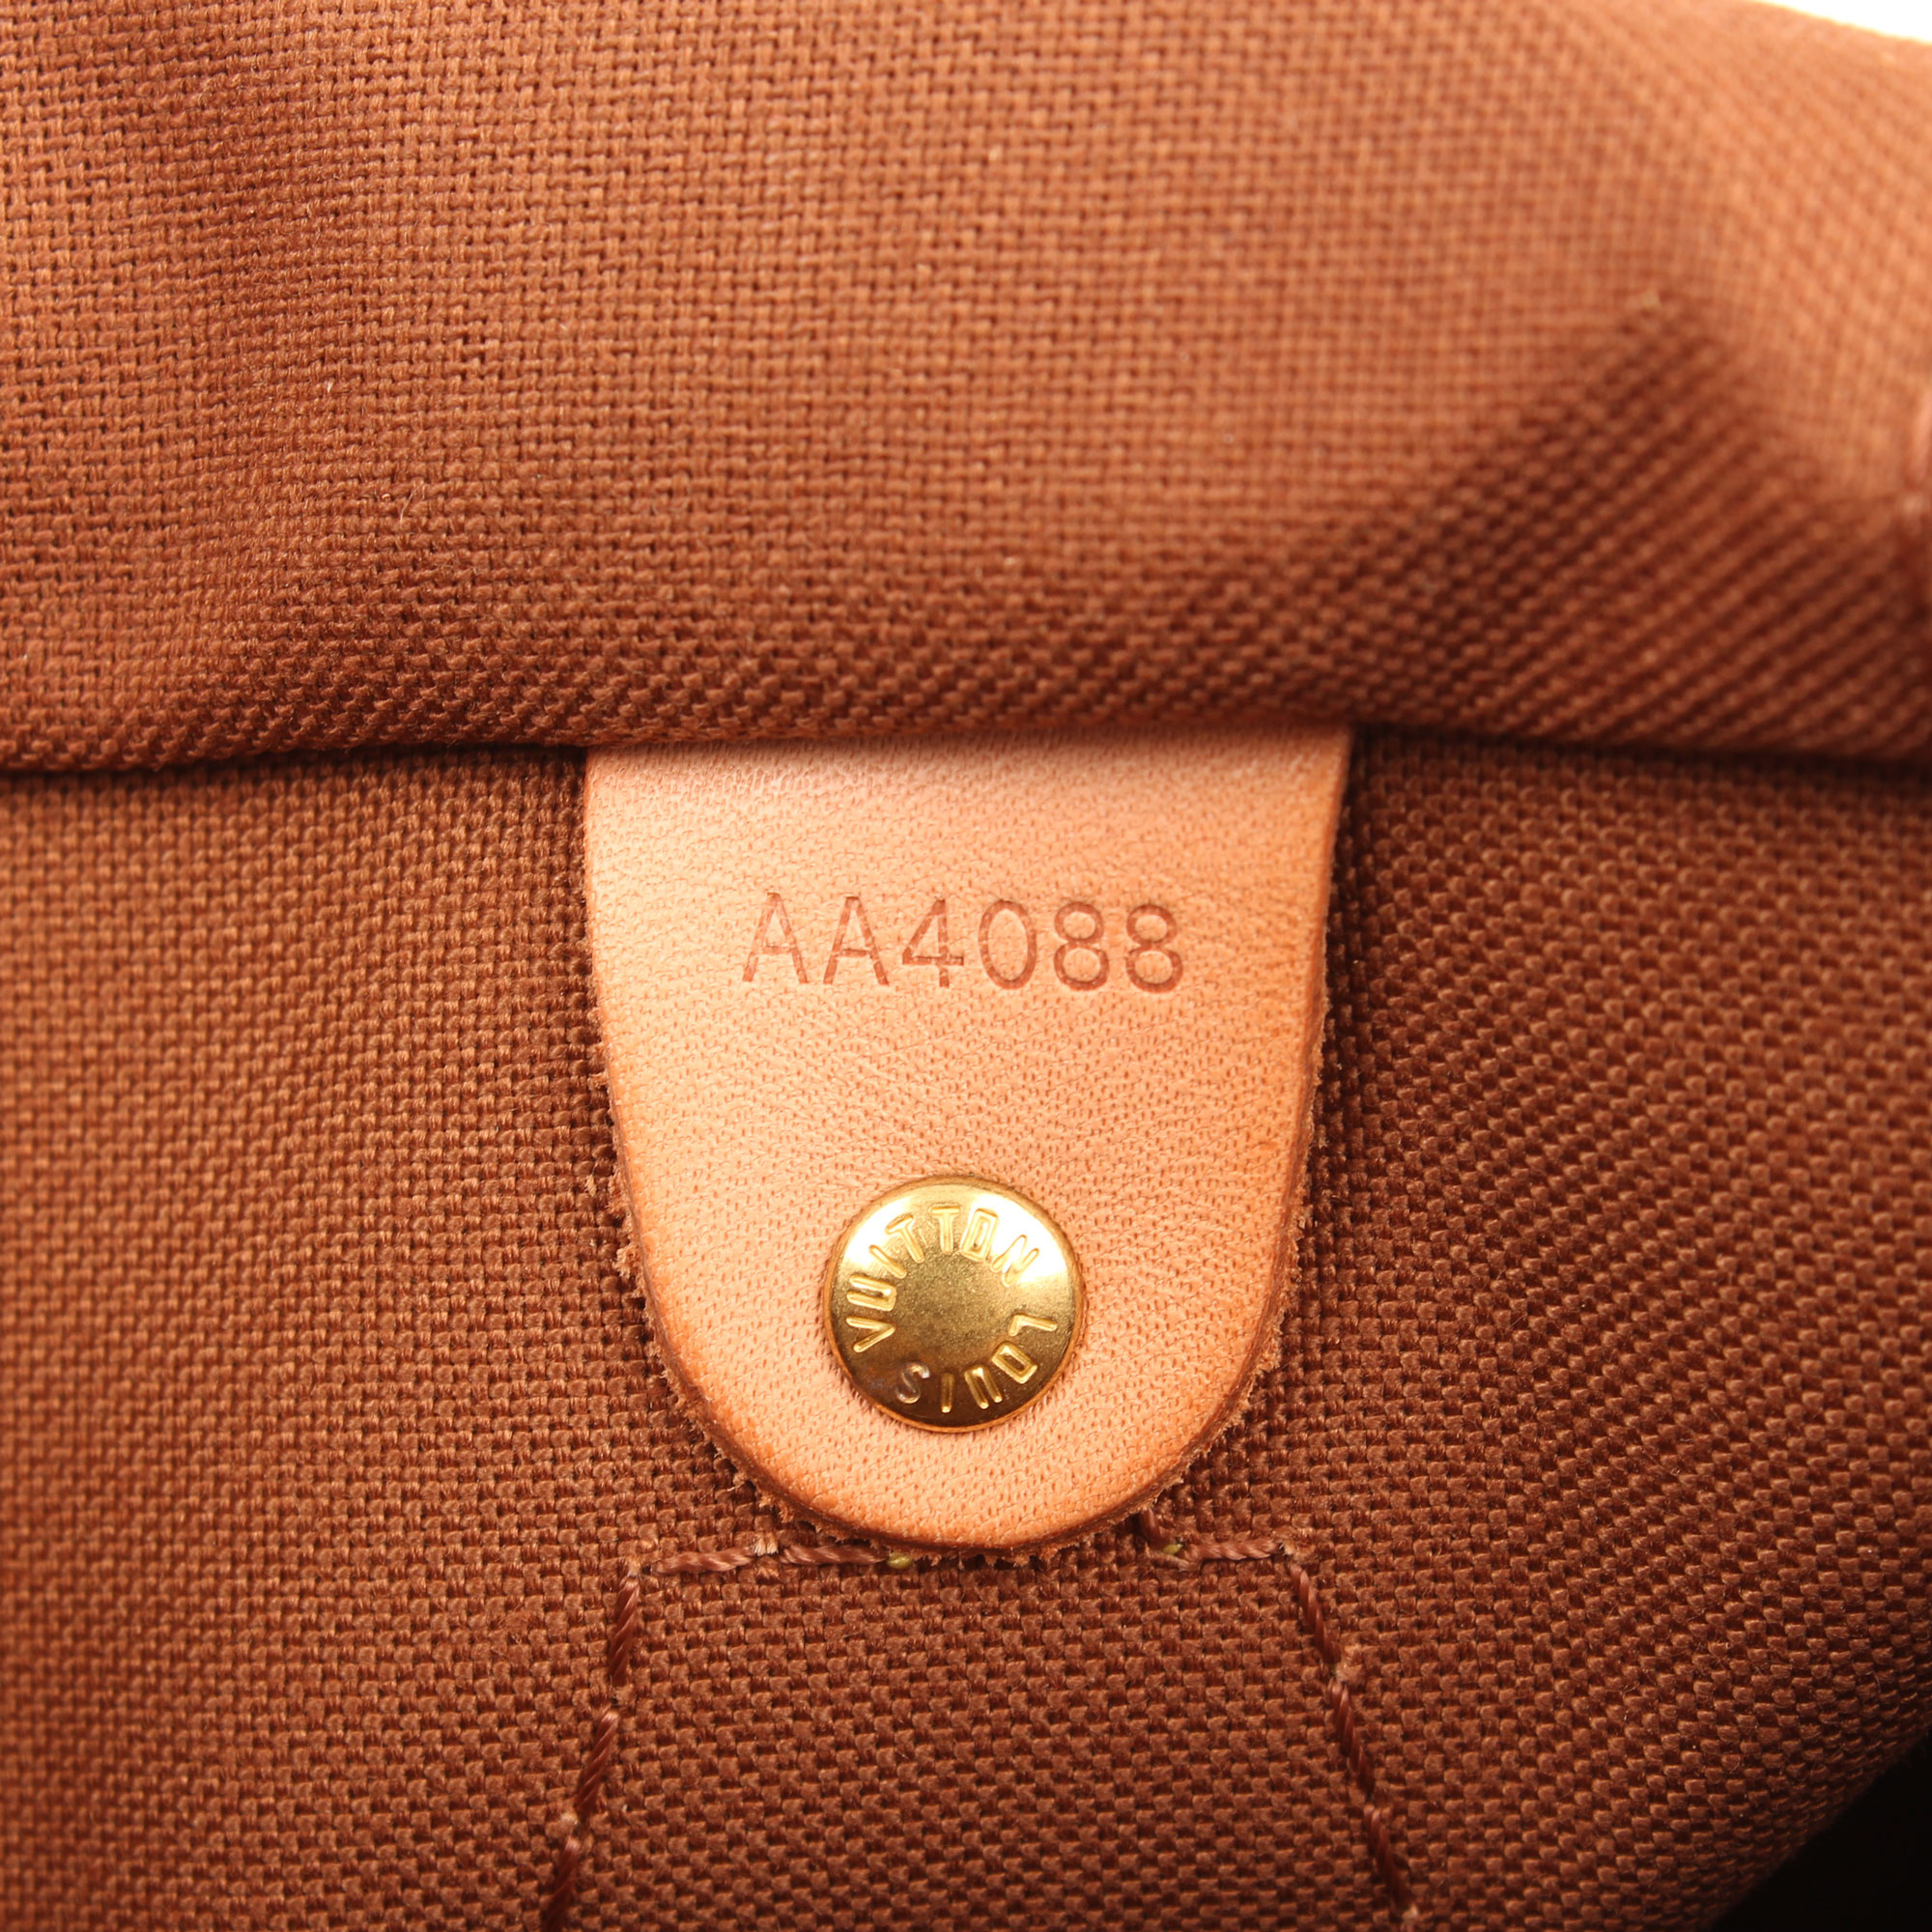 handbag louis vuitton speedy 25 monogram serial number